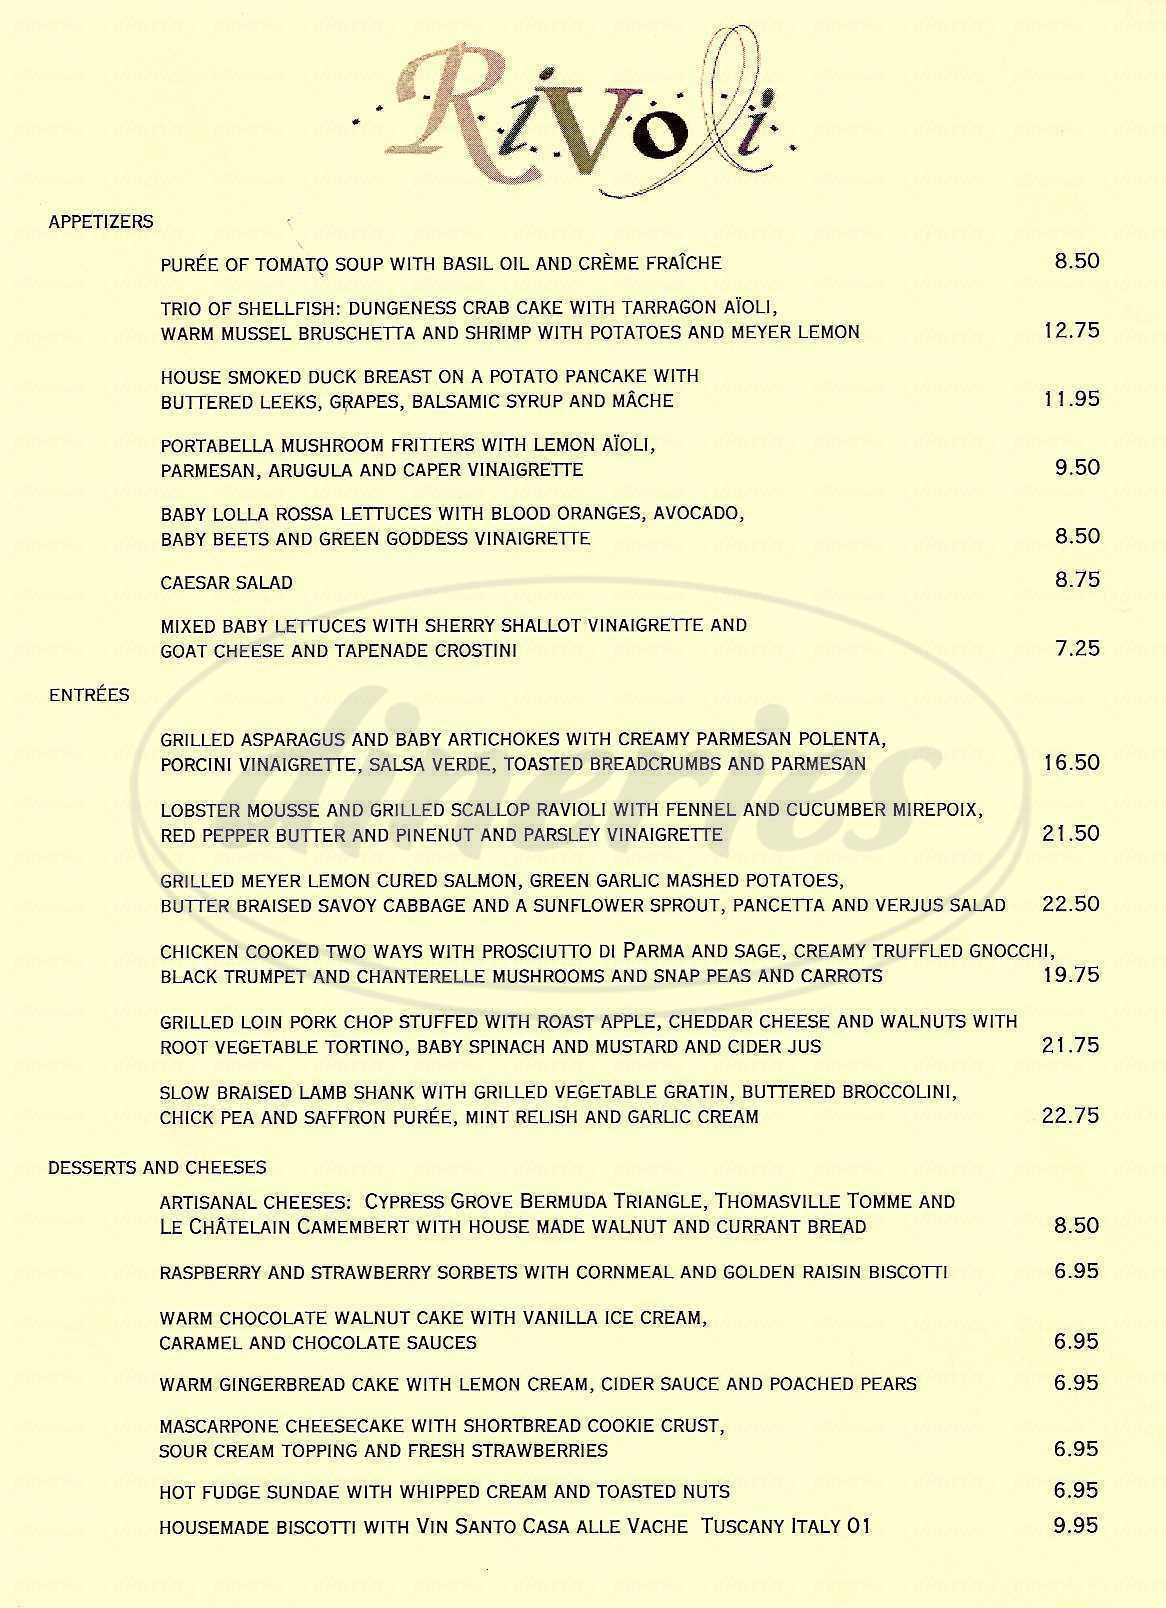 menu for Rivoli